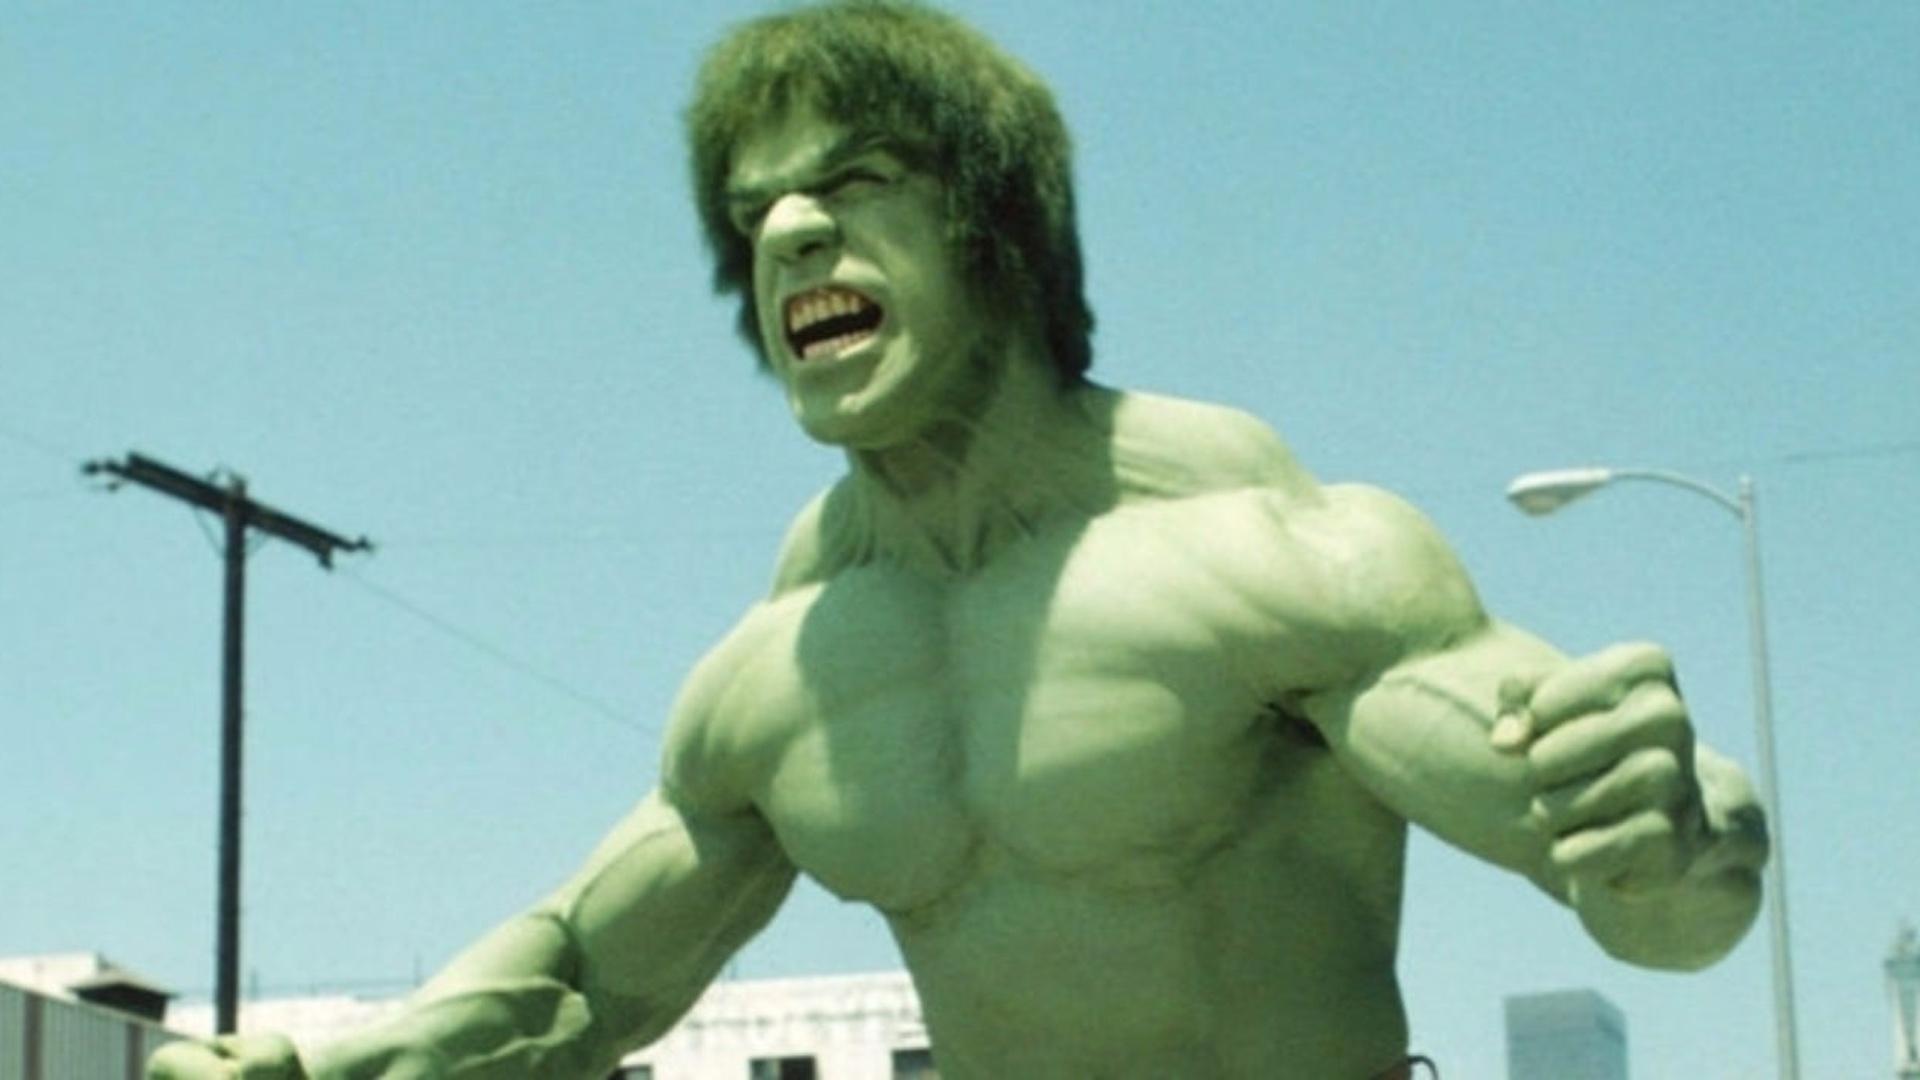 0975a12aad1c THE INCREDIBLE HULK Star Lou Ferrigno Says He Can't Take Mark Ruffalo's  Version of The Hulk Seriously — GeekTyrant